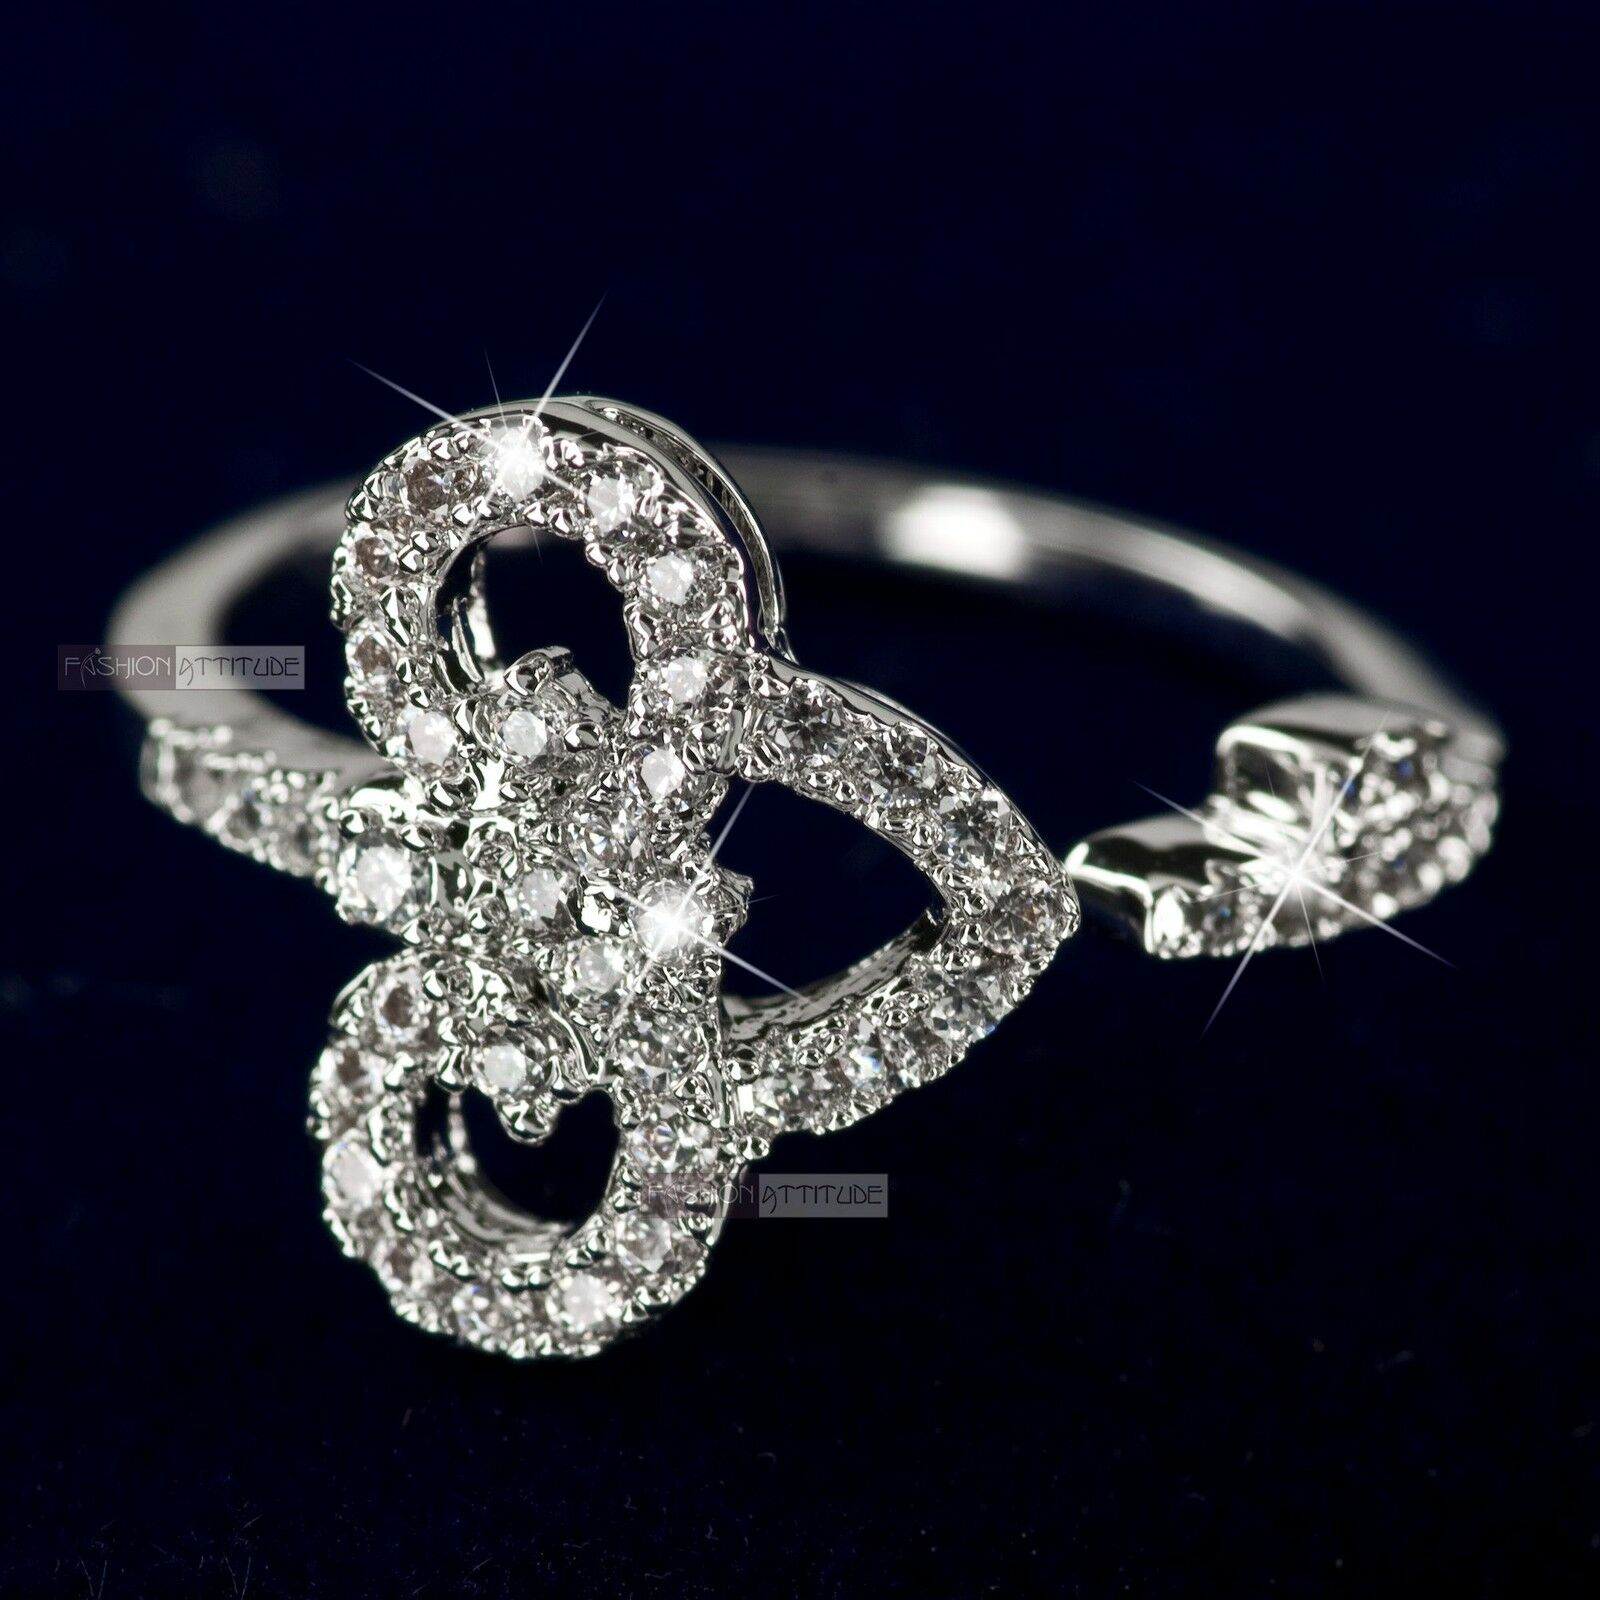 18K White Gold Plated women/'s wedding Ring Simulated Diamond